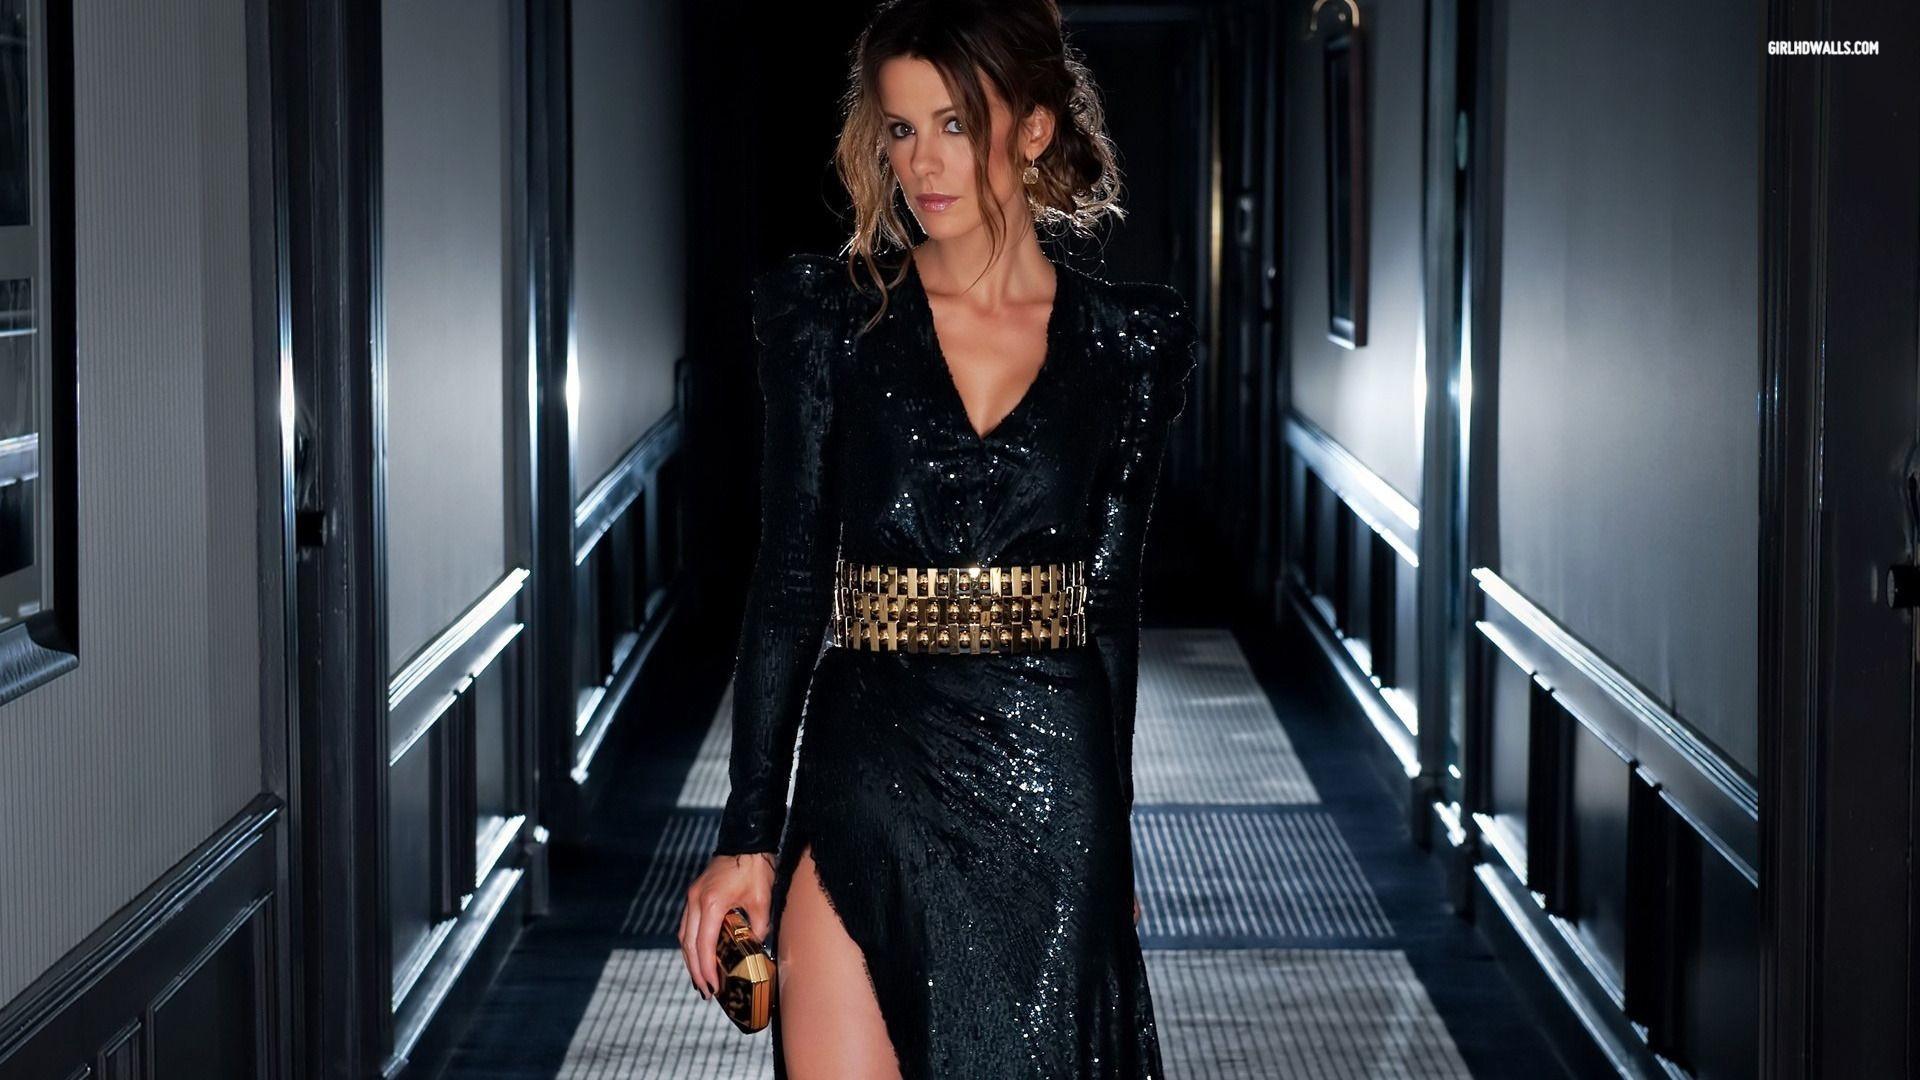 Kate Beckinsale Underworld Wallpaper 67 Pictures